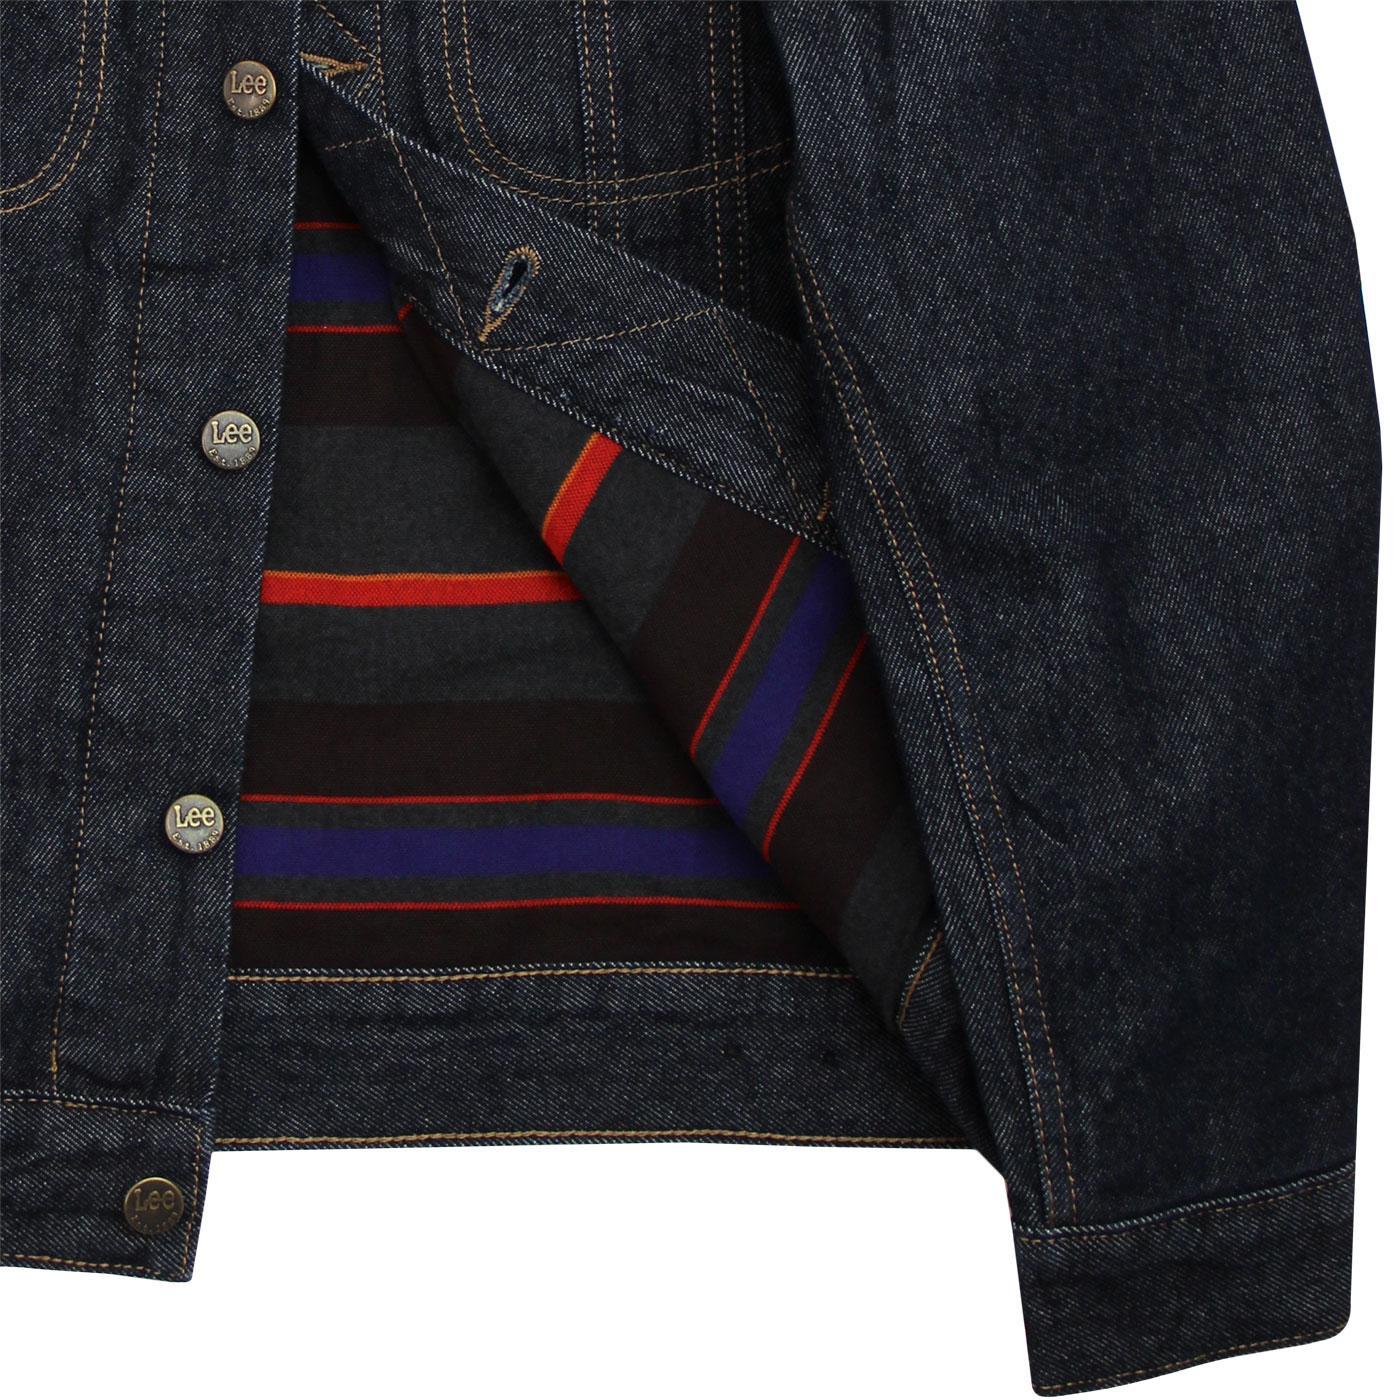 04b612ee2b1 LEE Storm Rider Men's Retro 70s Mod Cord & Denim Jacket